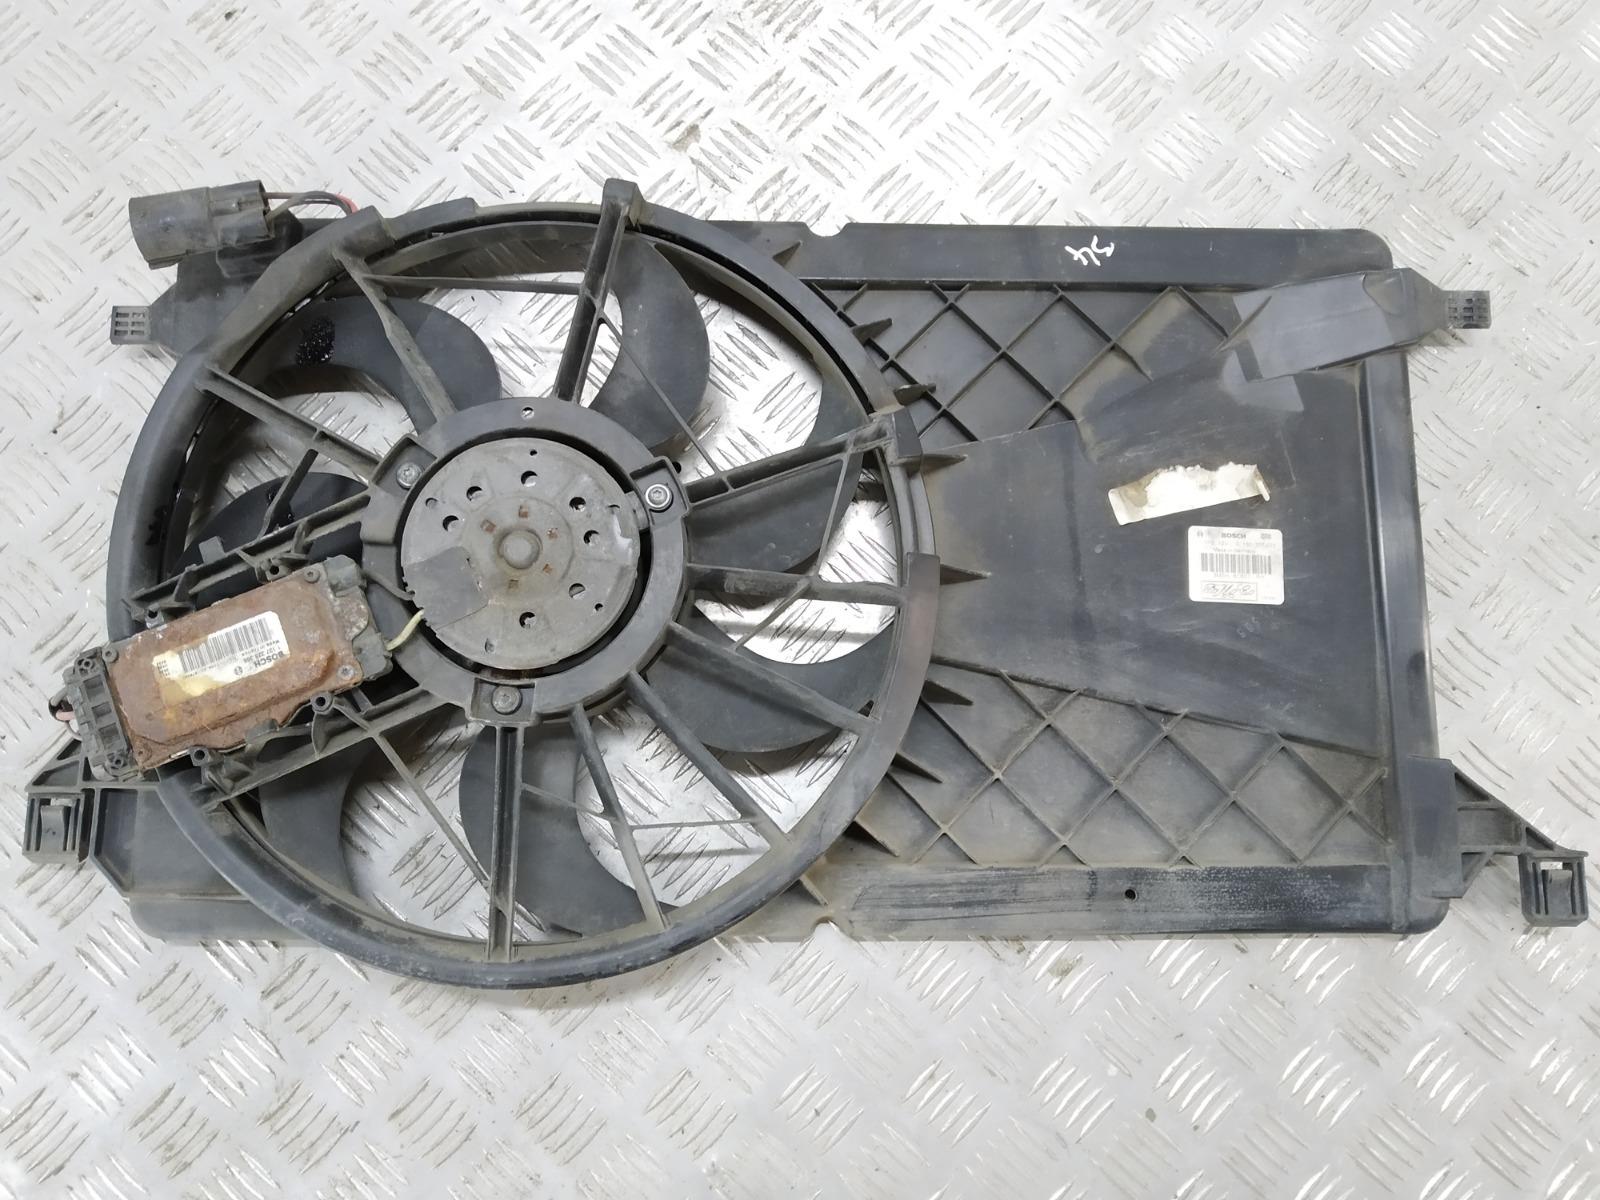 Вентилятор радиатора Ford Focus 1.8 I 2007 (б/у)